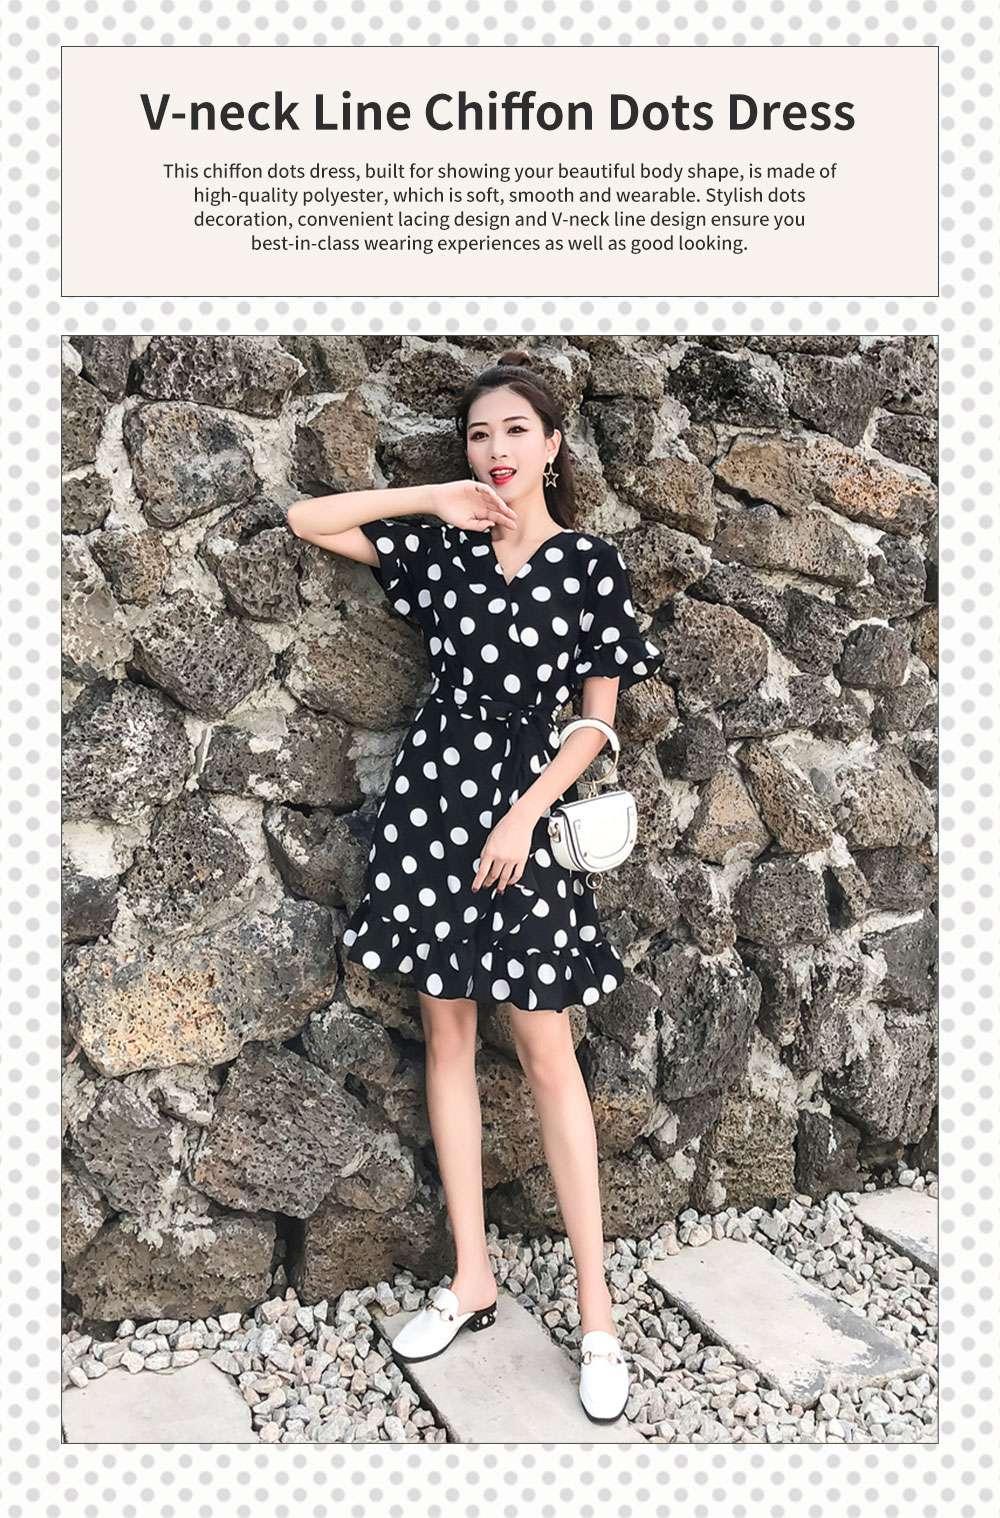 Elegant Fancy Dots Decorative V-Neck Line Dress Slim Fit Model Chiffon Lacing Dress with Falbala Sleeves 0